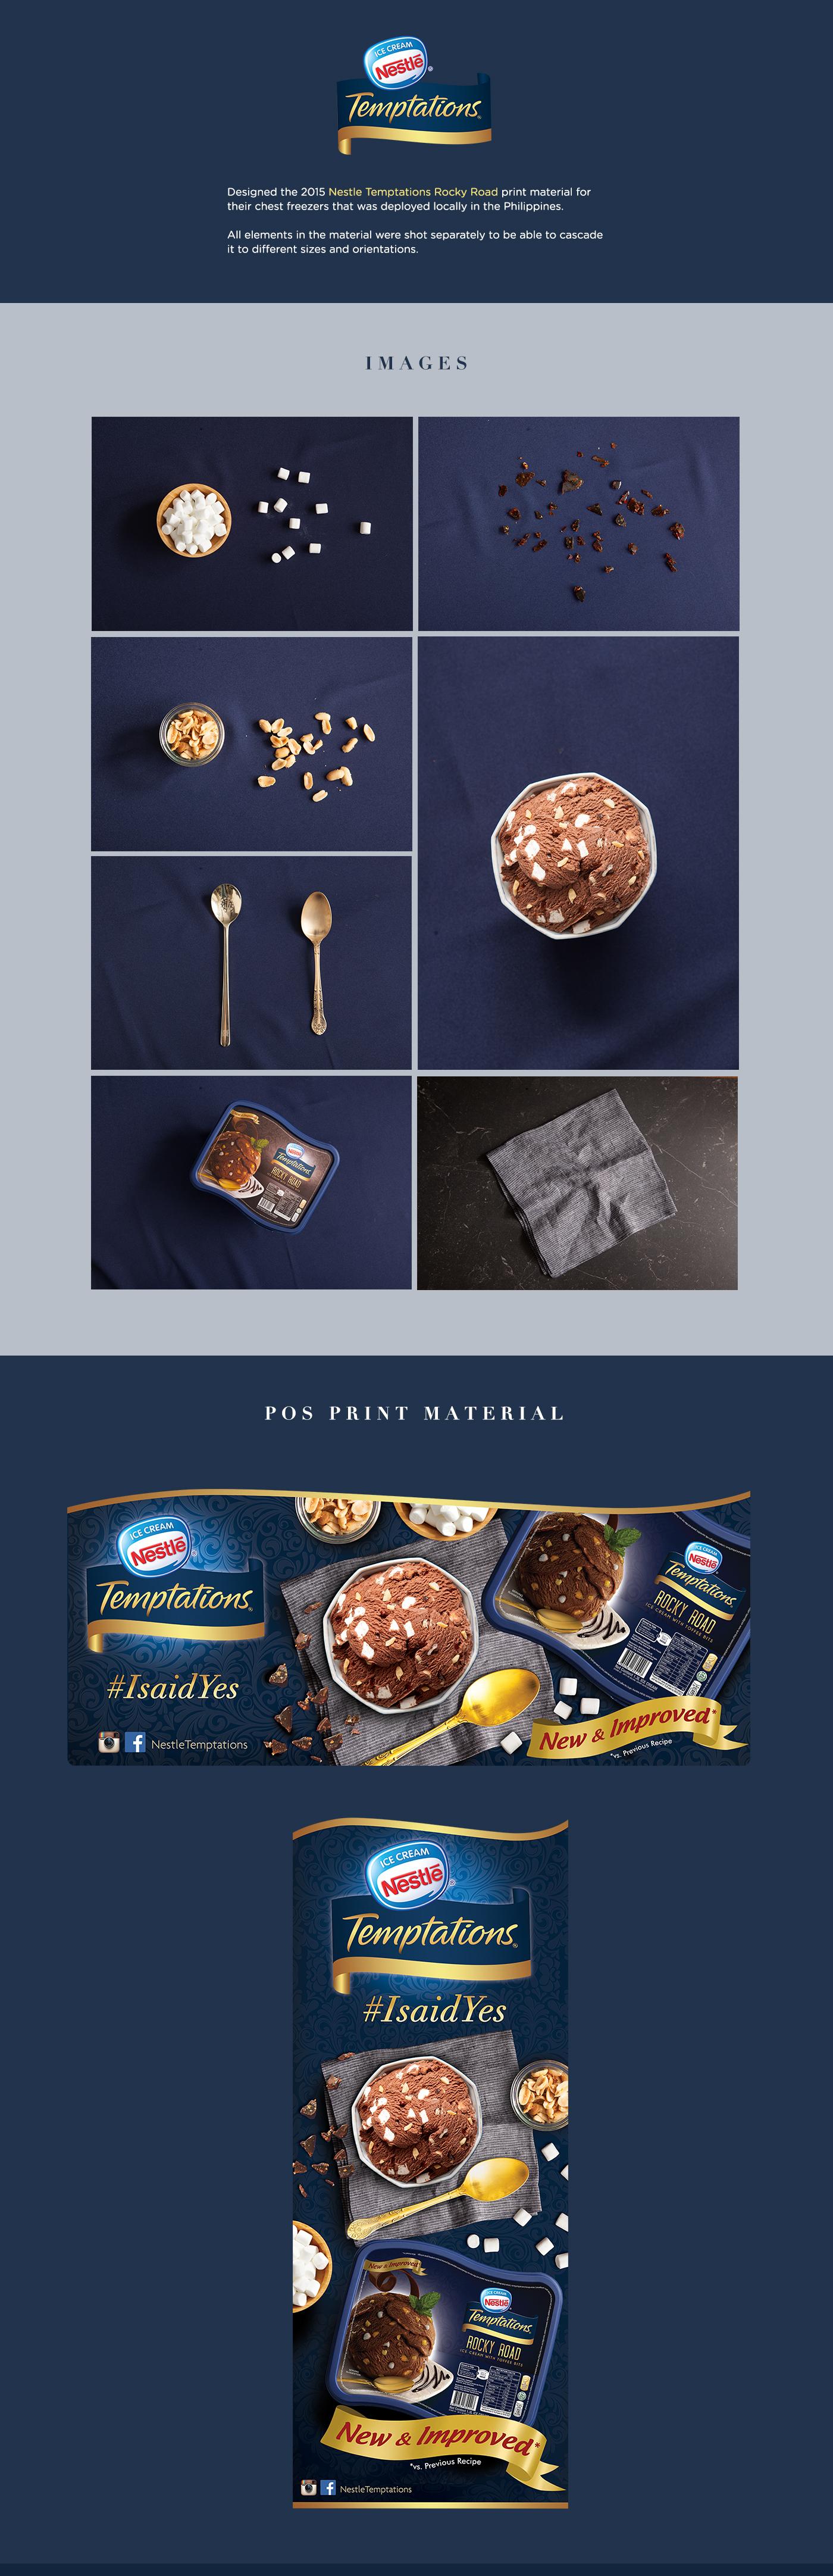 nestle Nestle Temptations Nestlé ice cream ice cream pos print composition print material ad rocky road tub